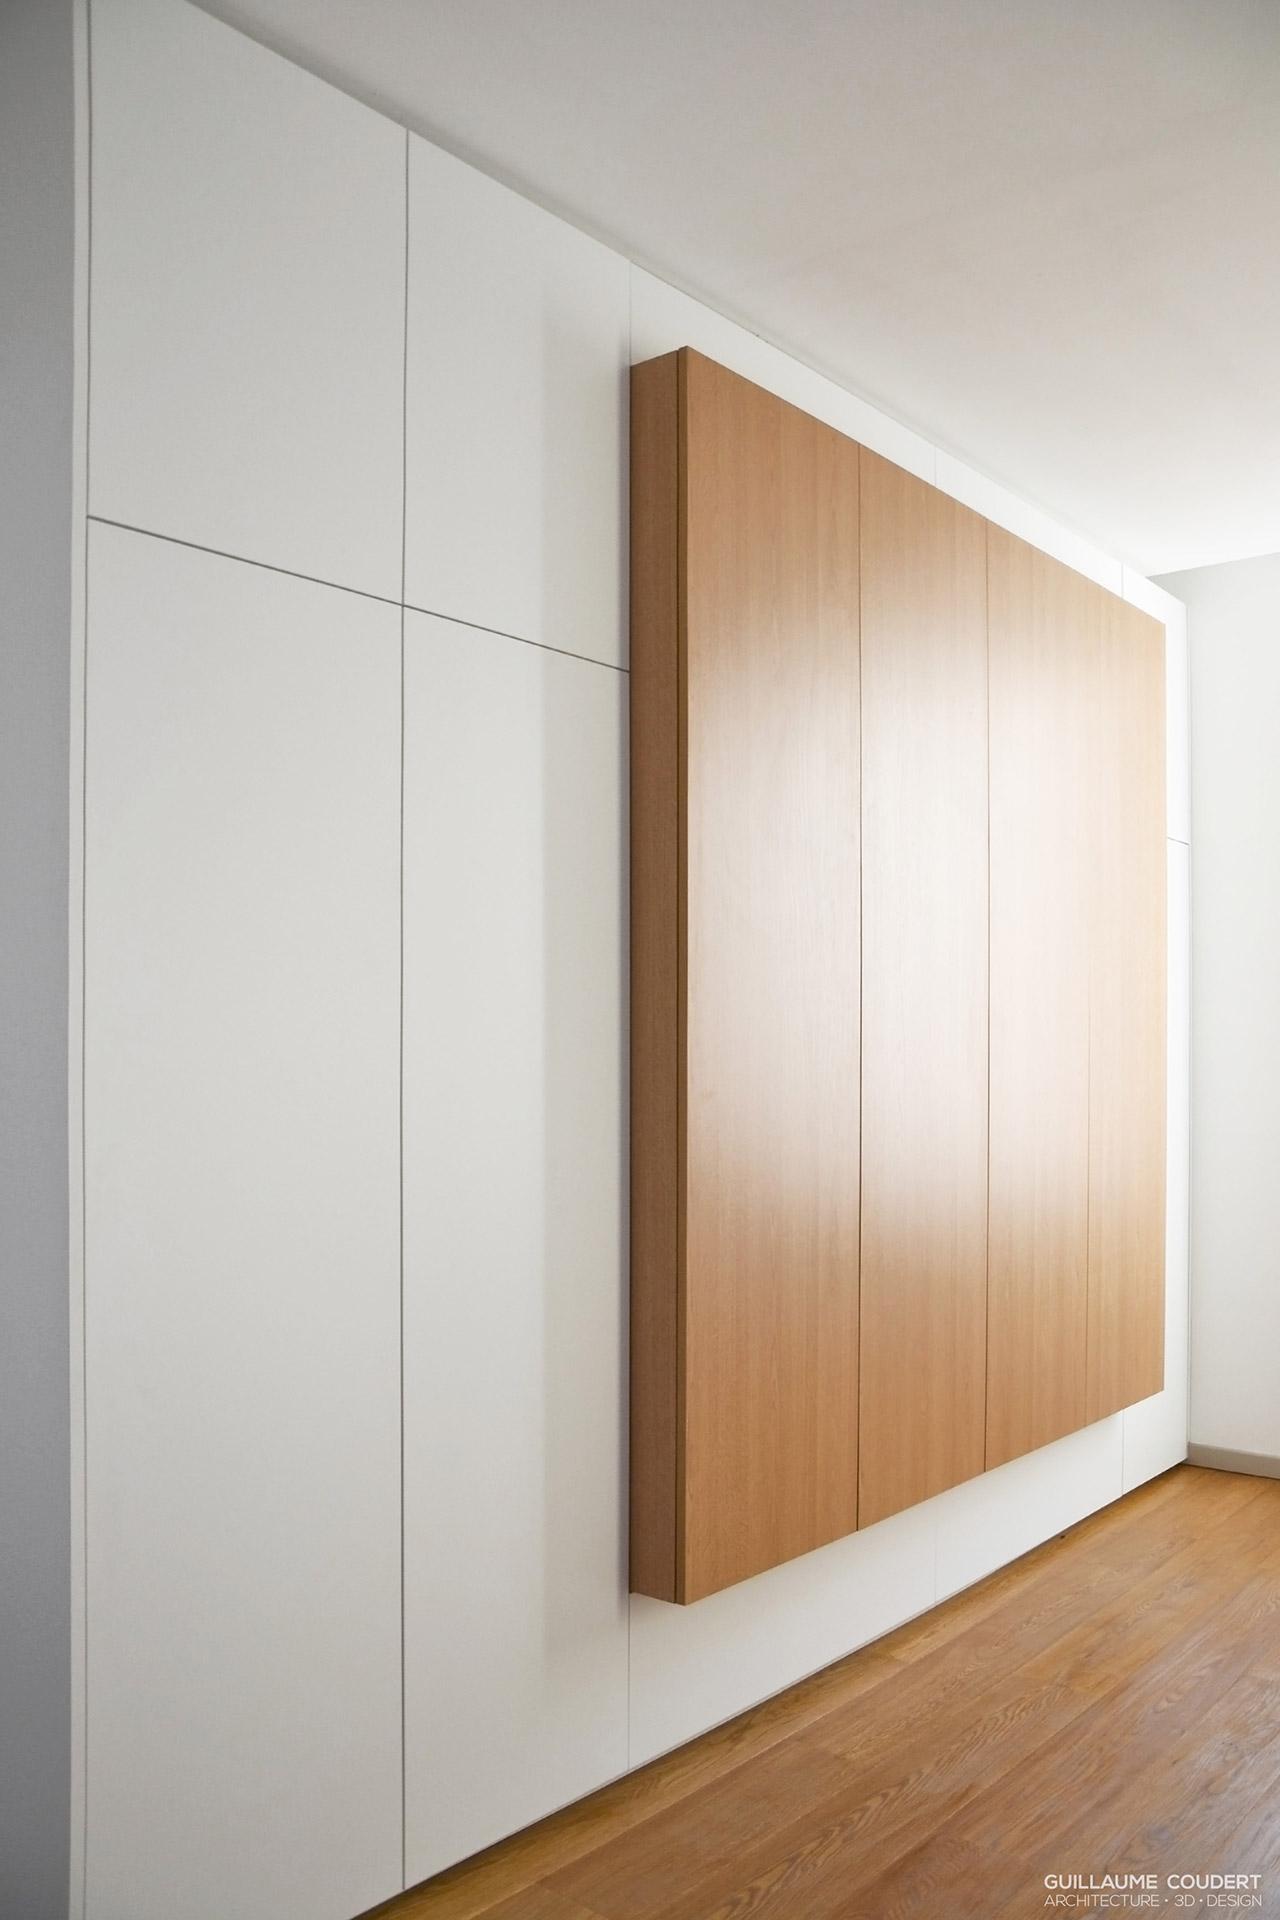 Chambre to01 lyon 69007 guillaume coudert architecture d 39 int rieur - Chambre meublee lyon ...